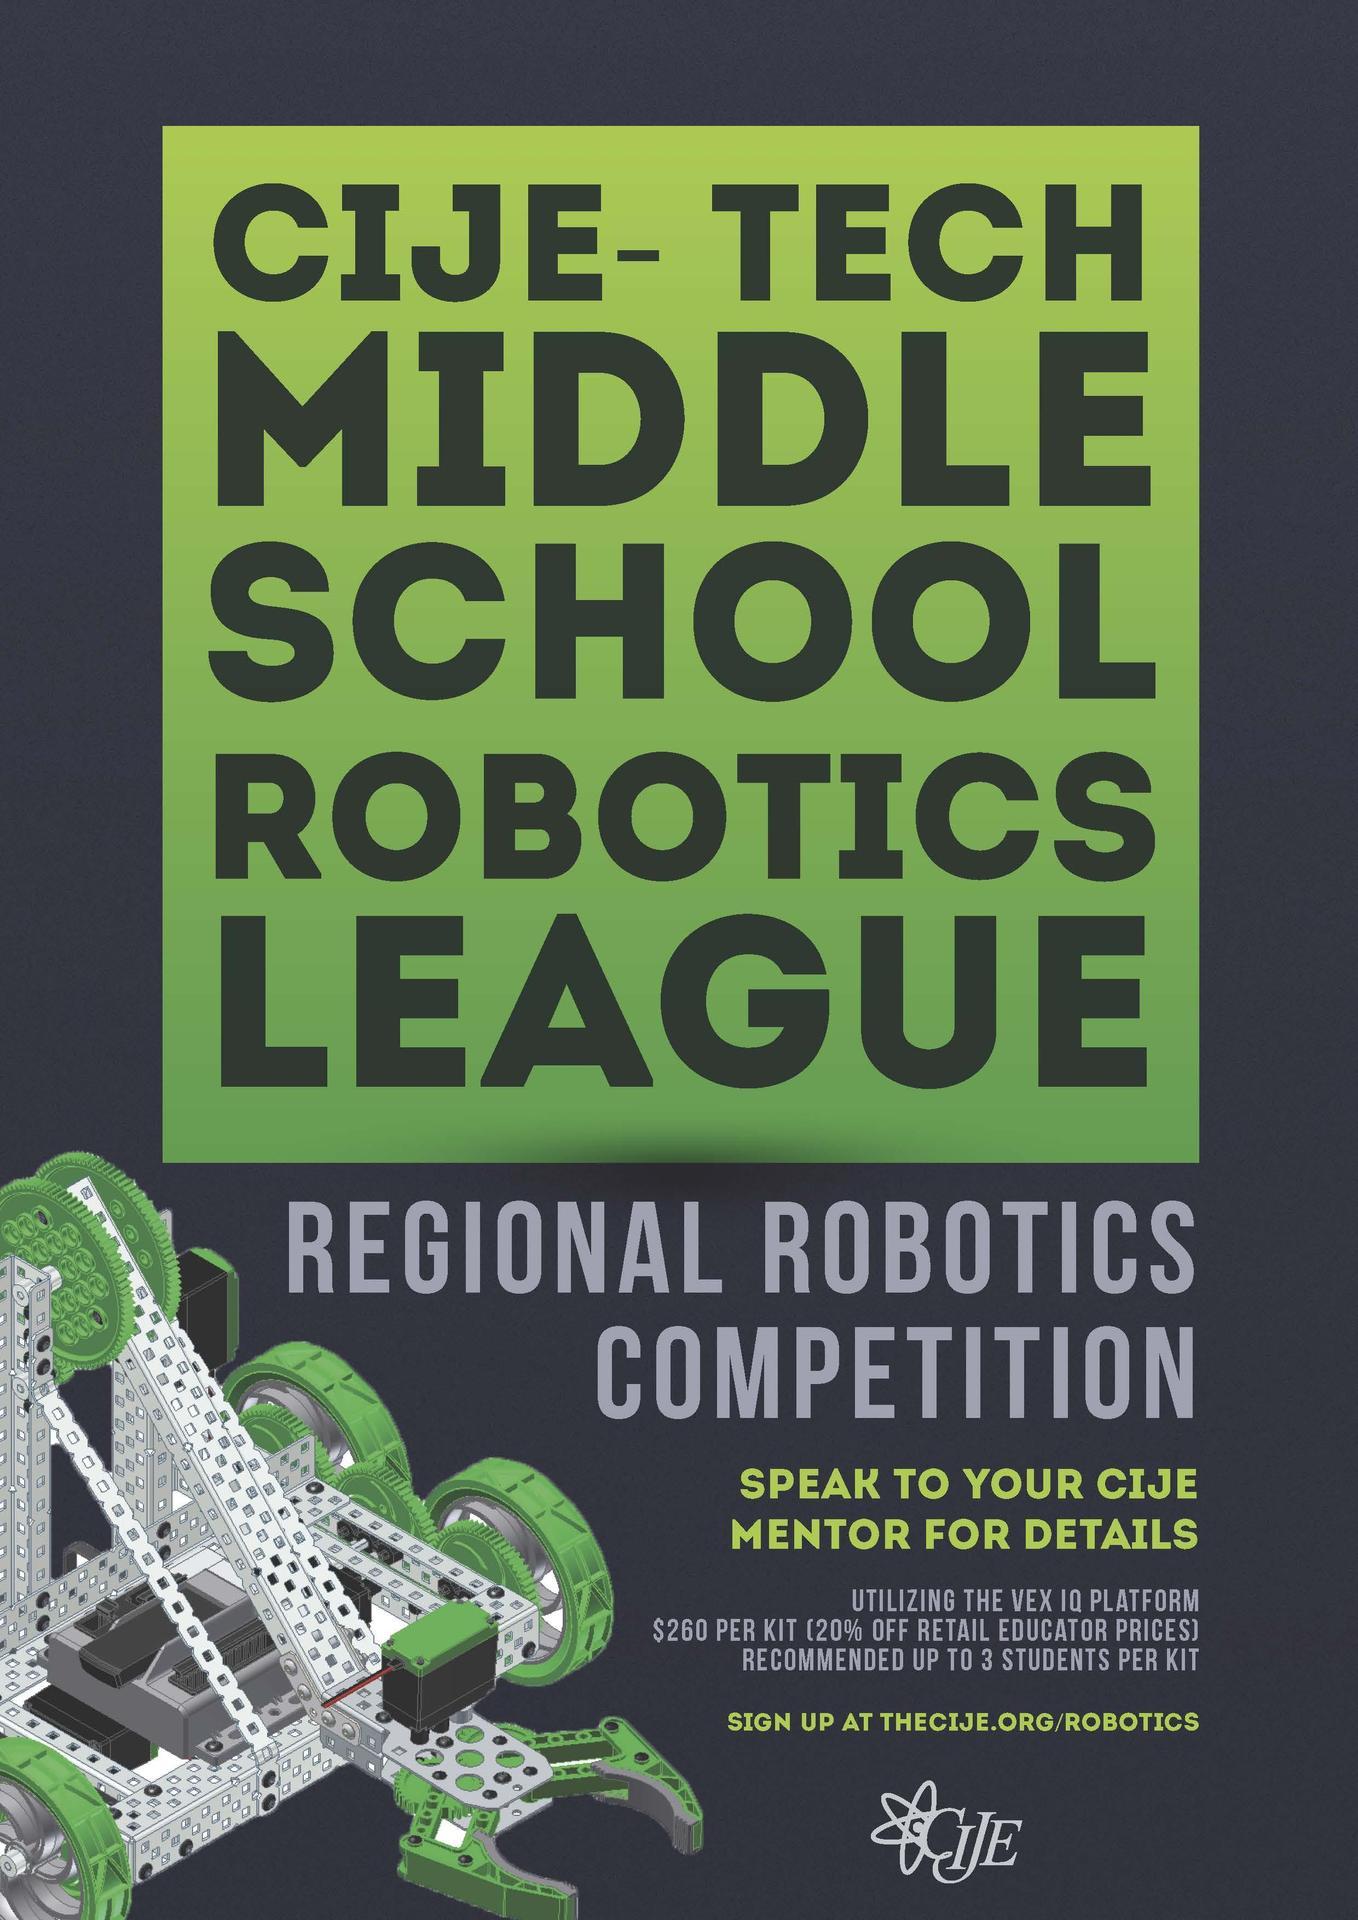 MS Robotics